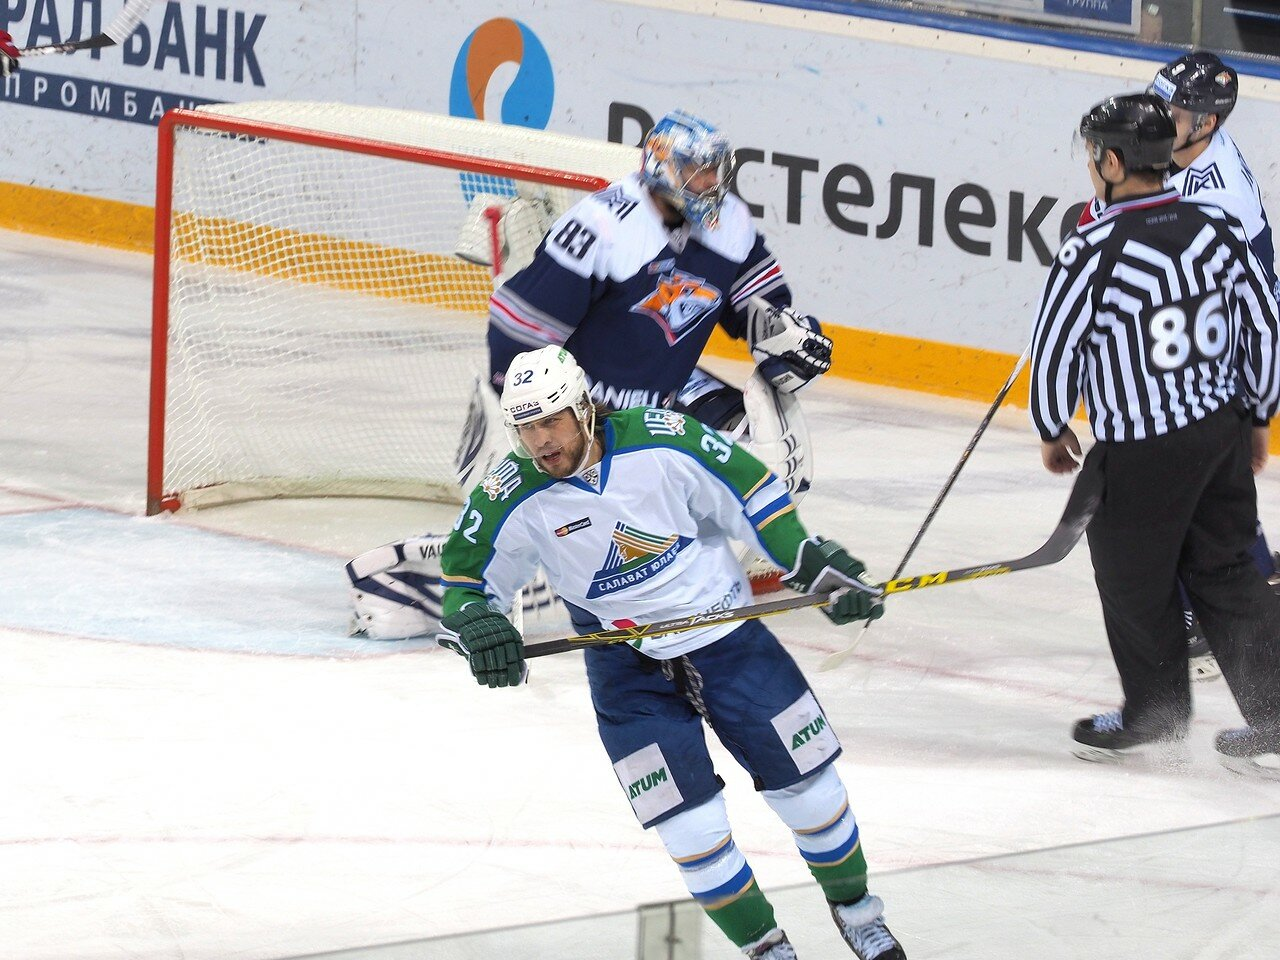 10Плей-офф 2016 Восток Финал Металлург - Салават Юлаев 25.03.2016